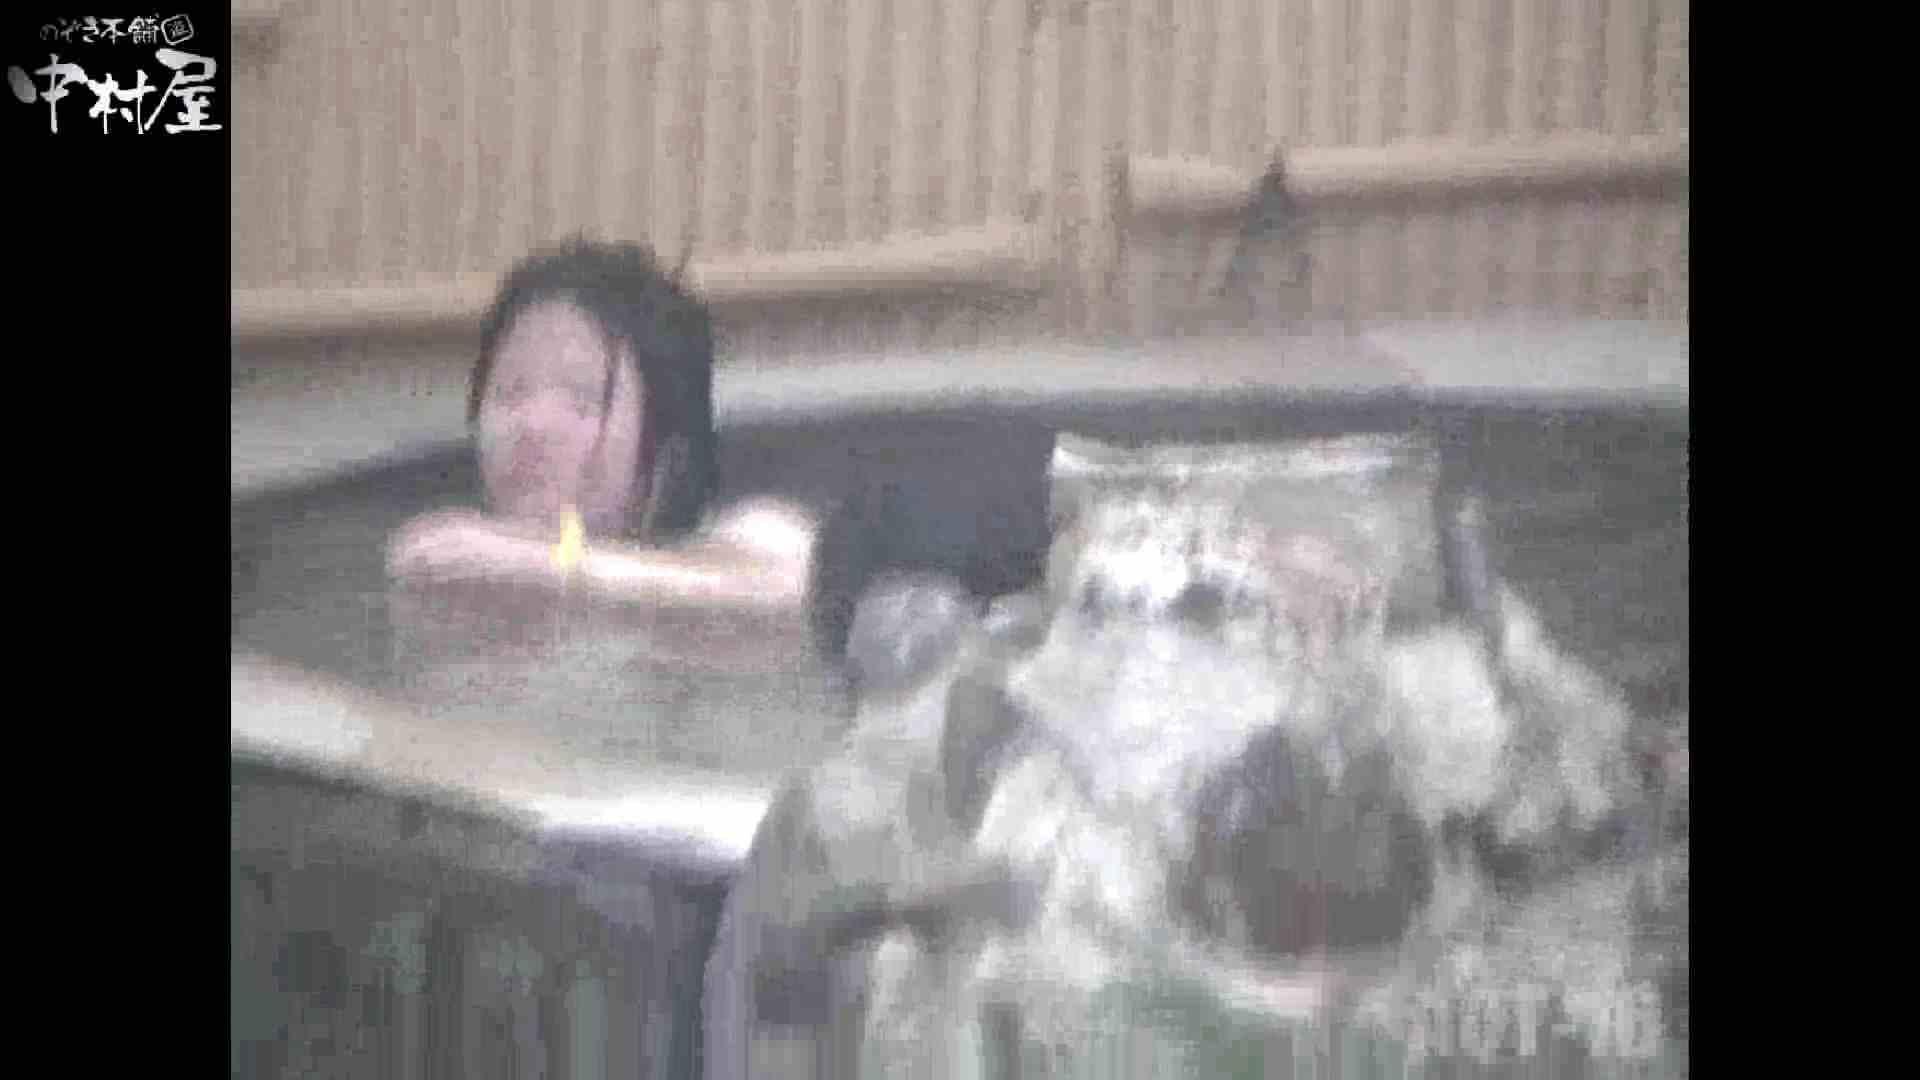 Aquaな露天風呂Vol.880潜入盗撮露天風呂十六判湯 其の八 潜入 | 盗撮動画  9枚 7